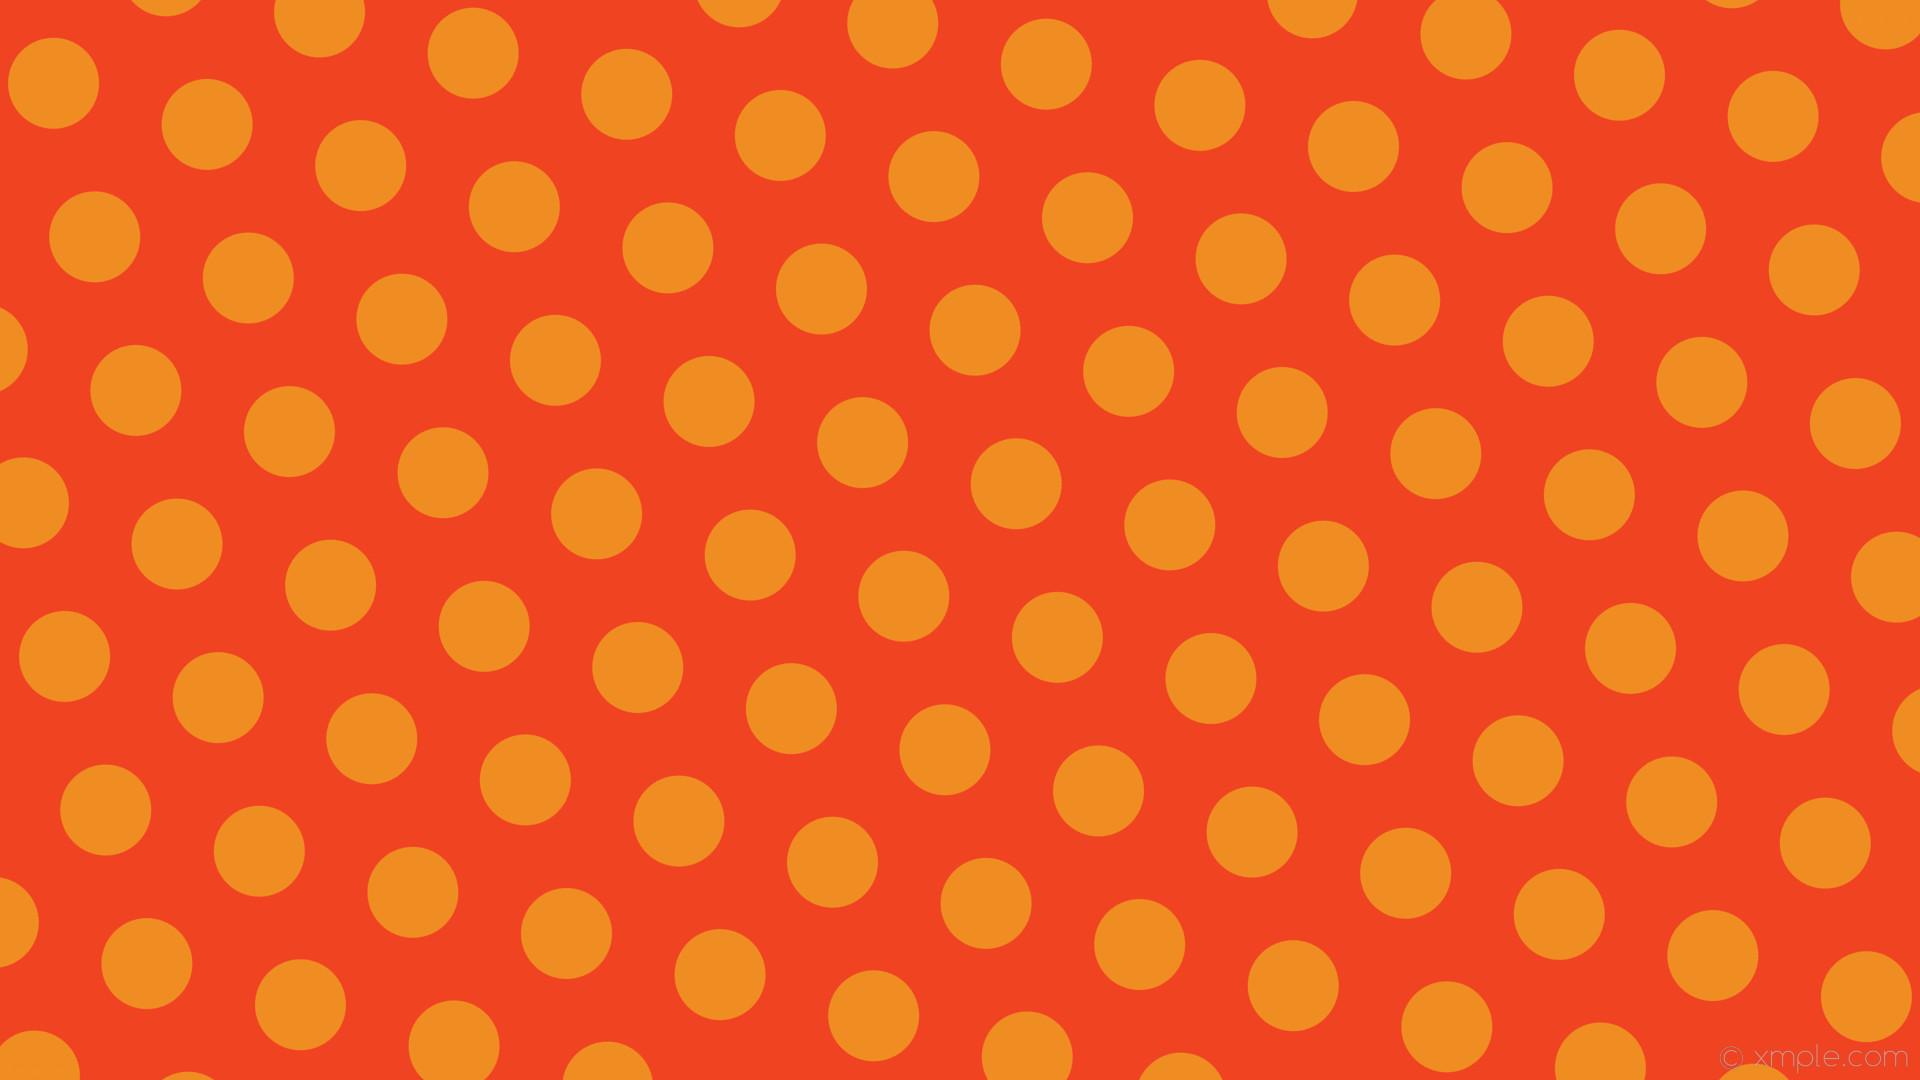 wallpaper hexagon red polka dots orange #f04322 #f08d22 diagonal 45° 91px  159px